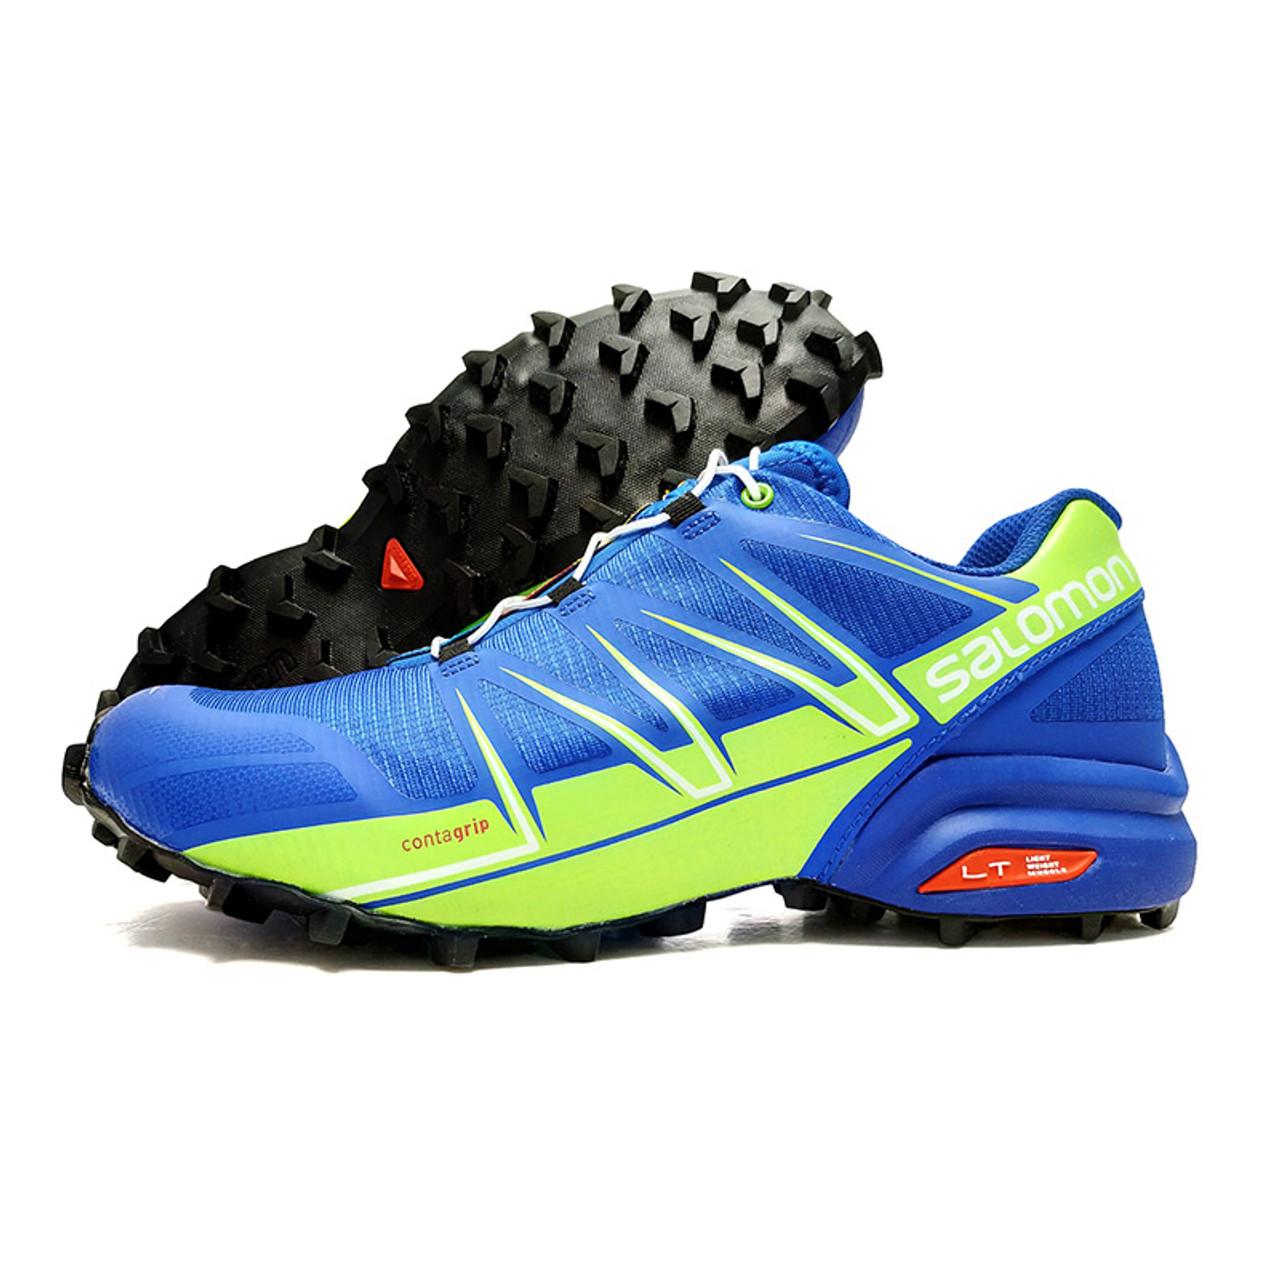 brand new 40d6a 0b33b Salomon Shoes zapatos hombre Speed Cross 3 5 CS Sneakers Men Sport shoes  Blue Green Male Athletics Jogging Shoes Fencing Shoes